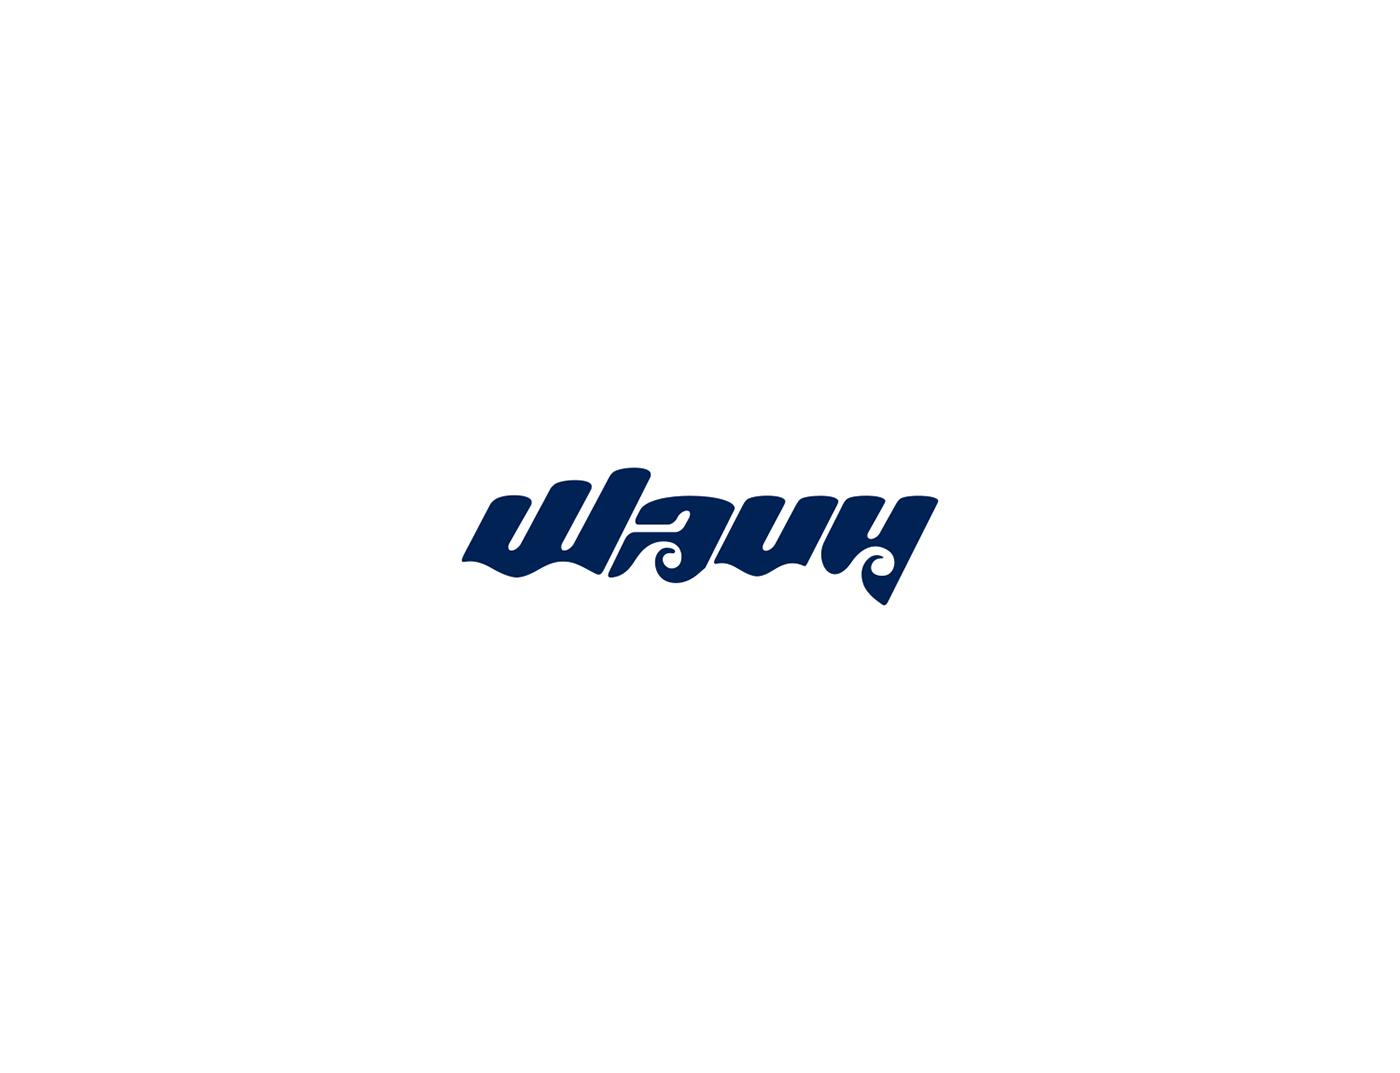 logo dsign logo graphic design  typography   identity monogram food logo retail logo animal logo